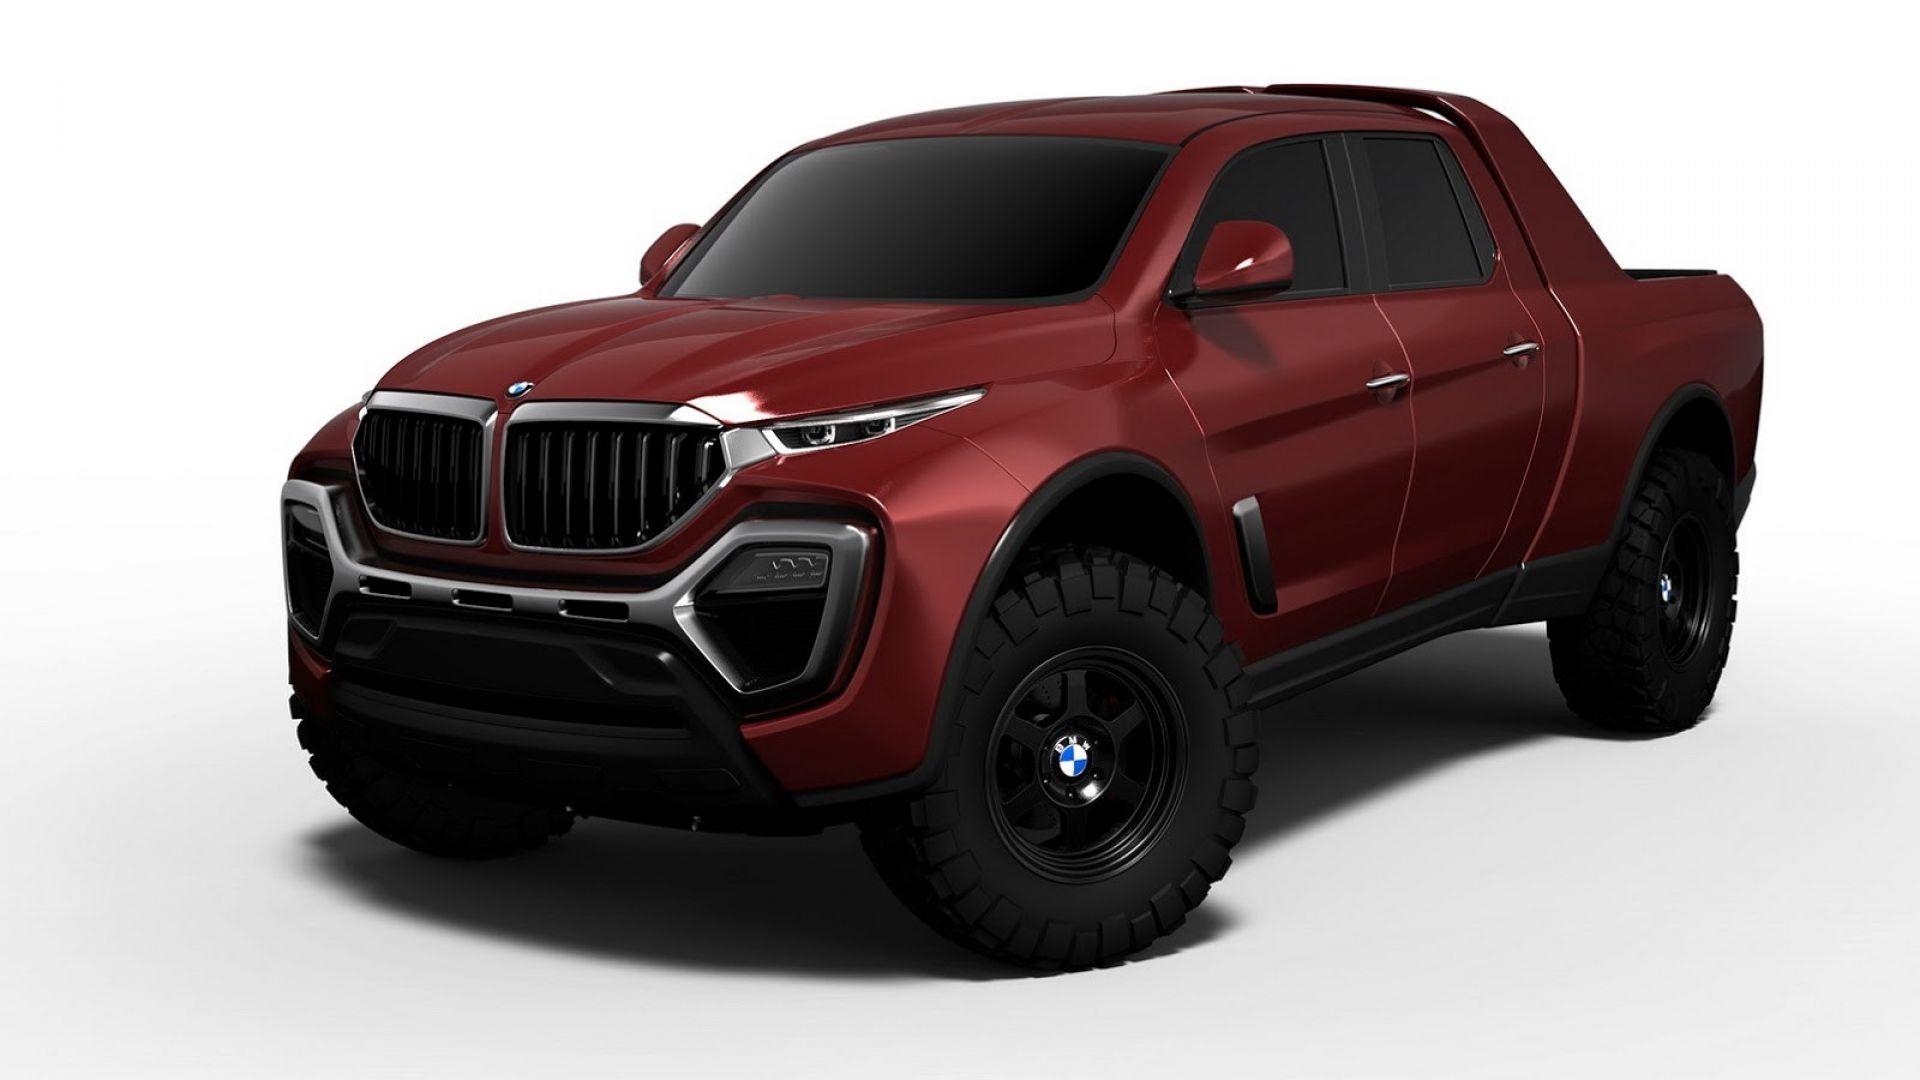 Concept Dalla Bmw X5 Un Pick Up Per Contrastare Mercedes